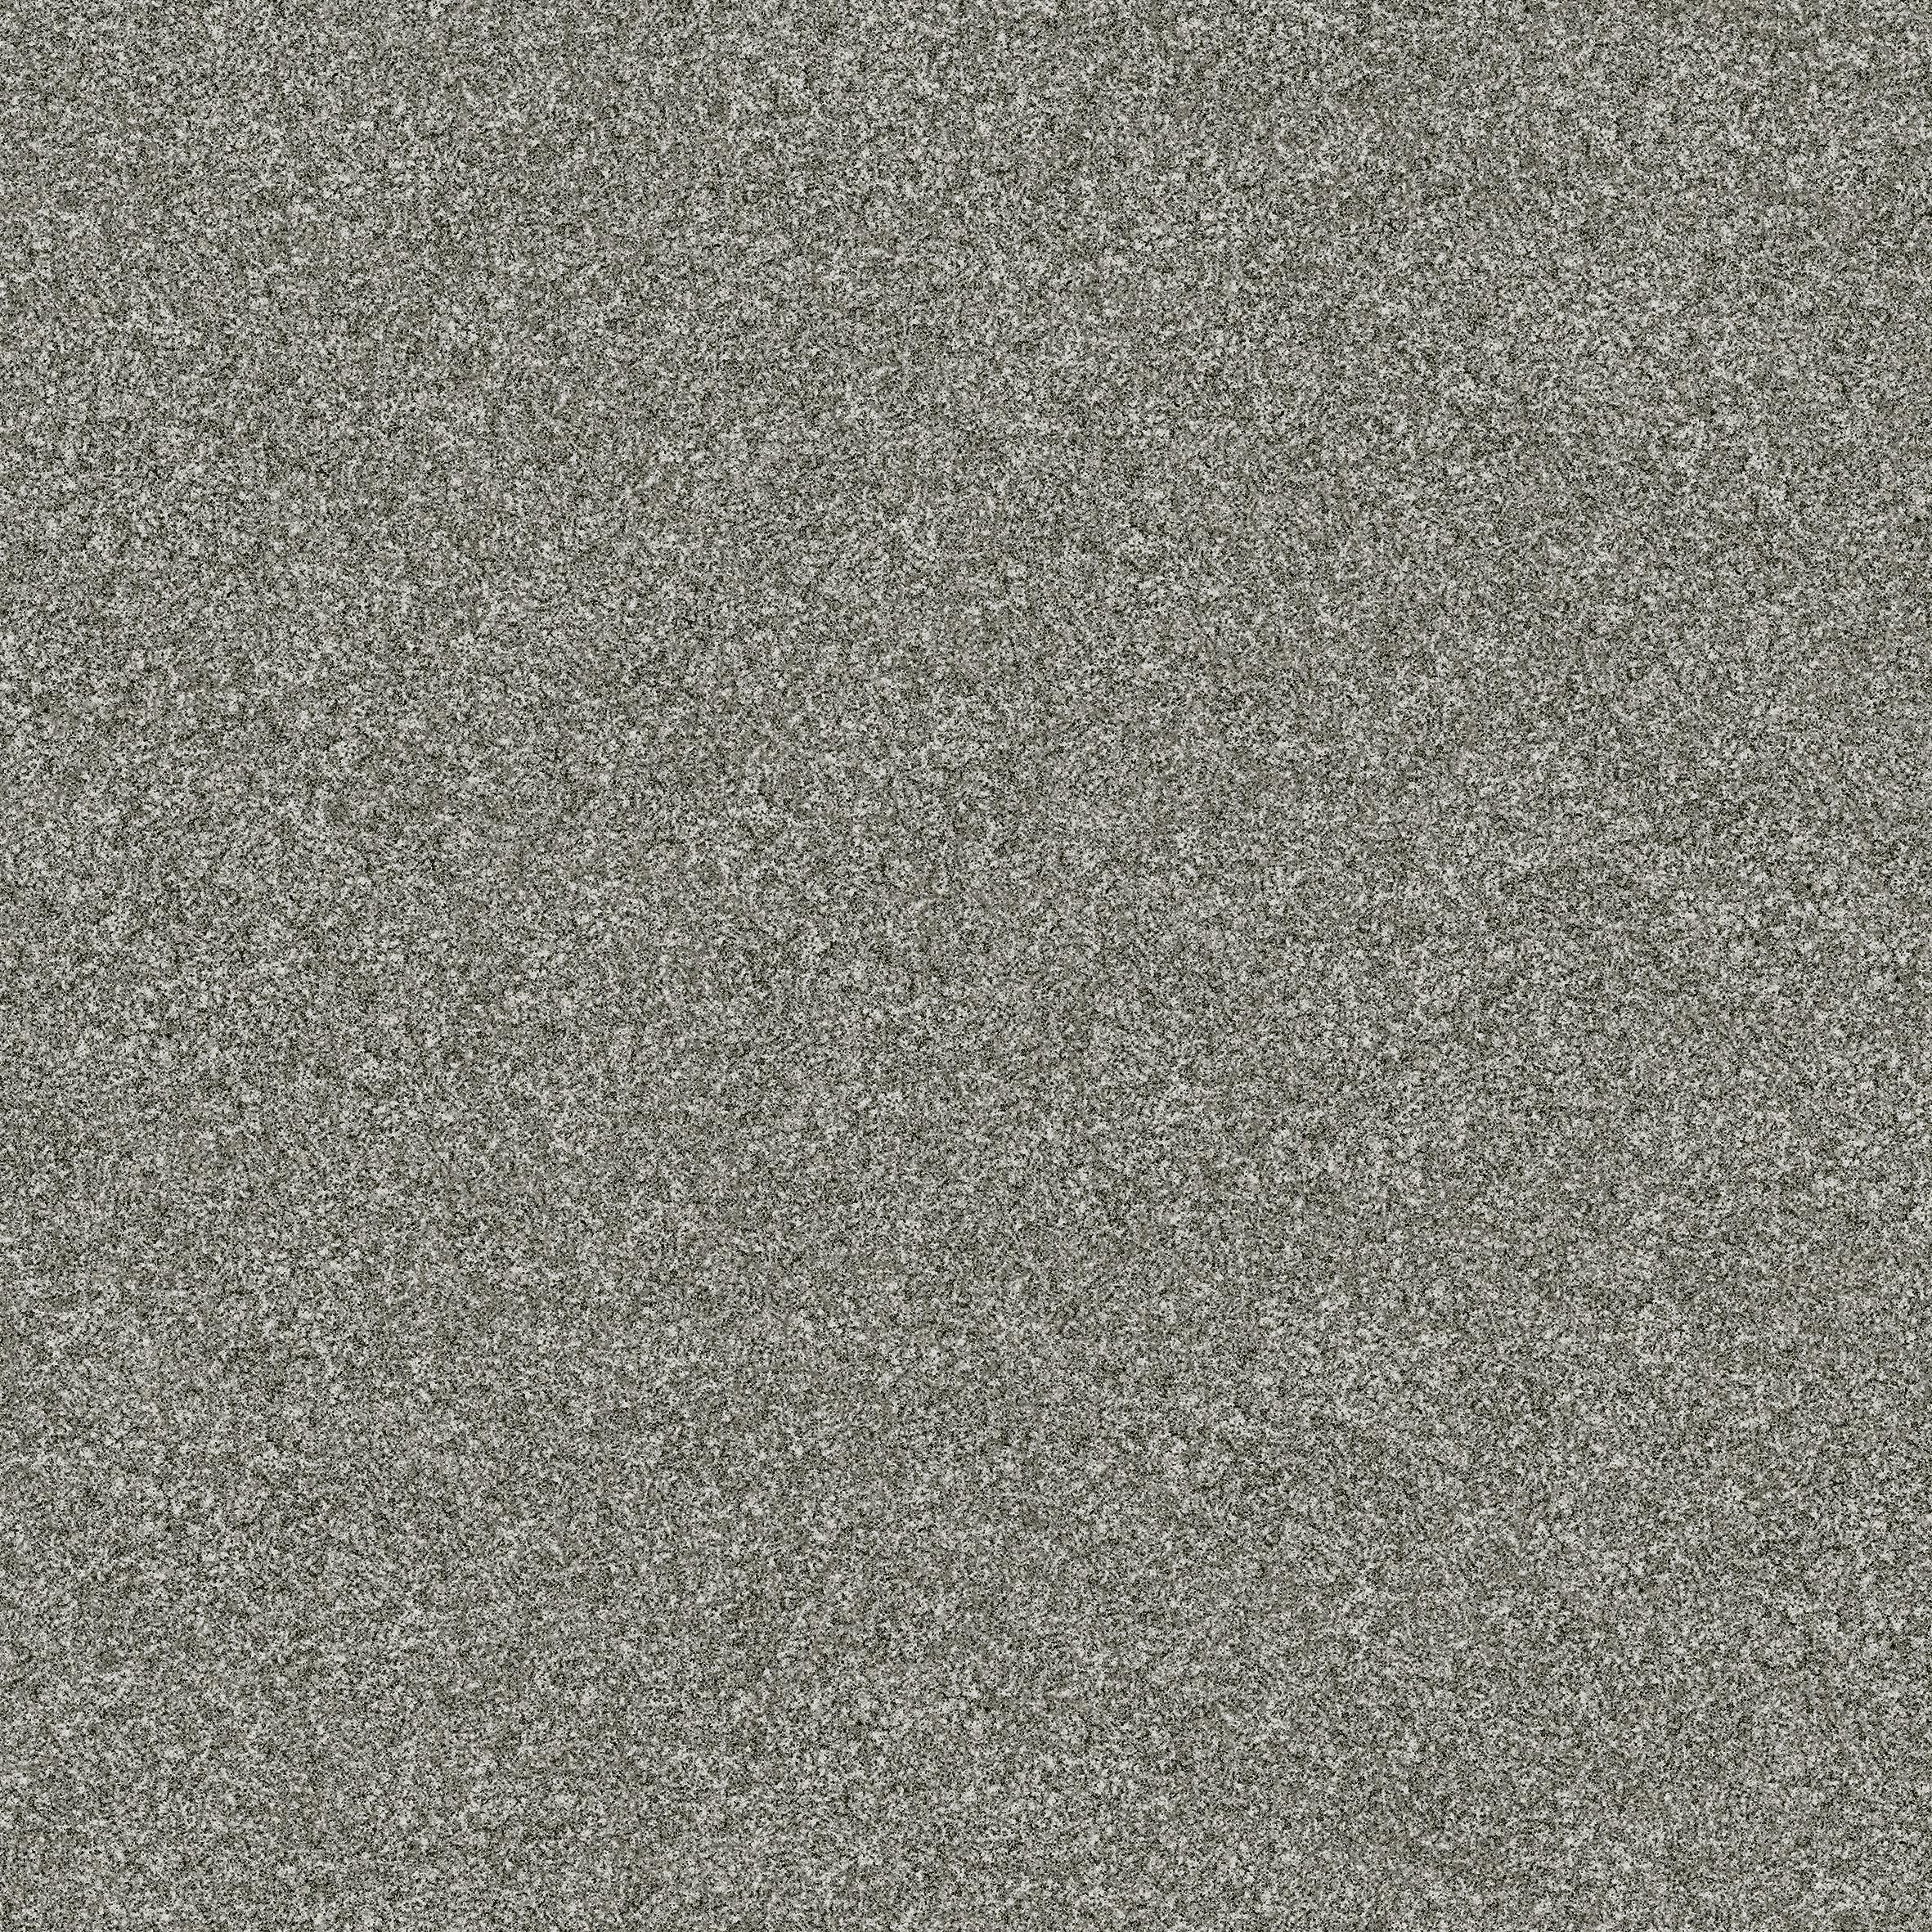 66HG02A芝麻深灰